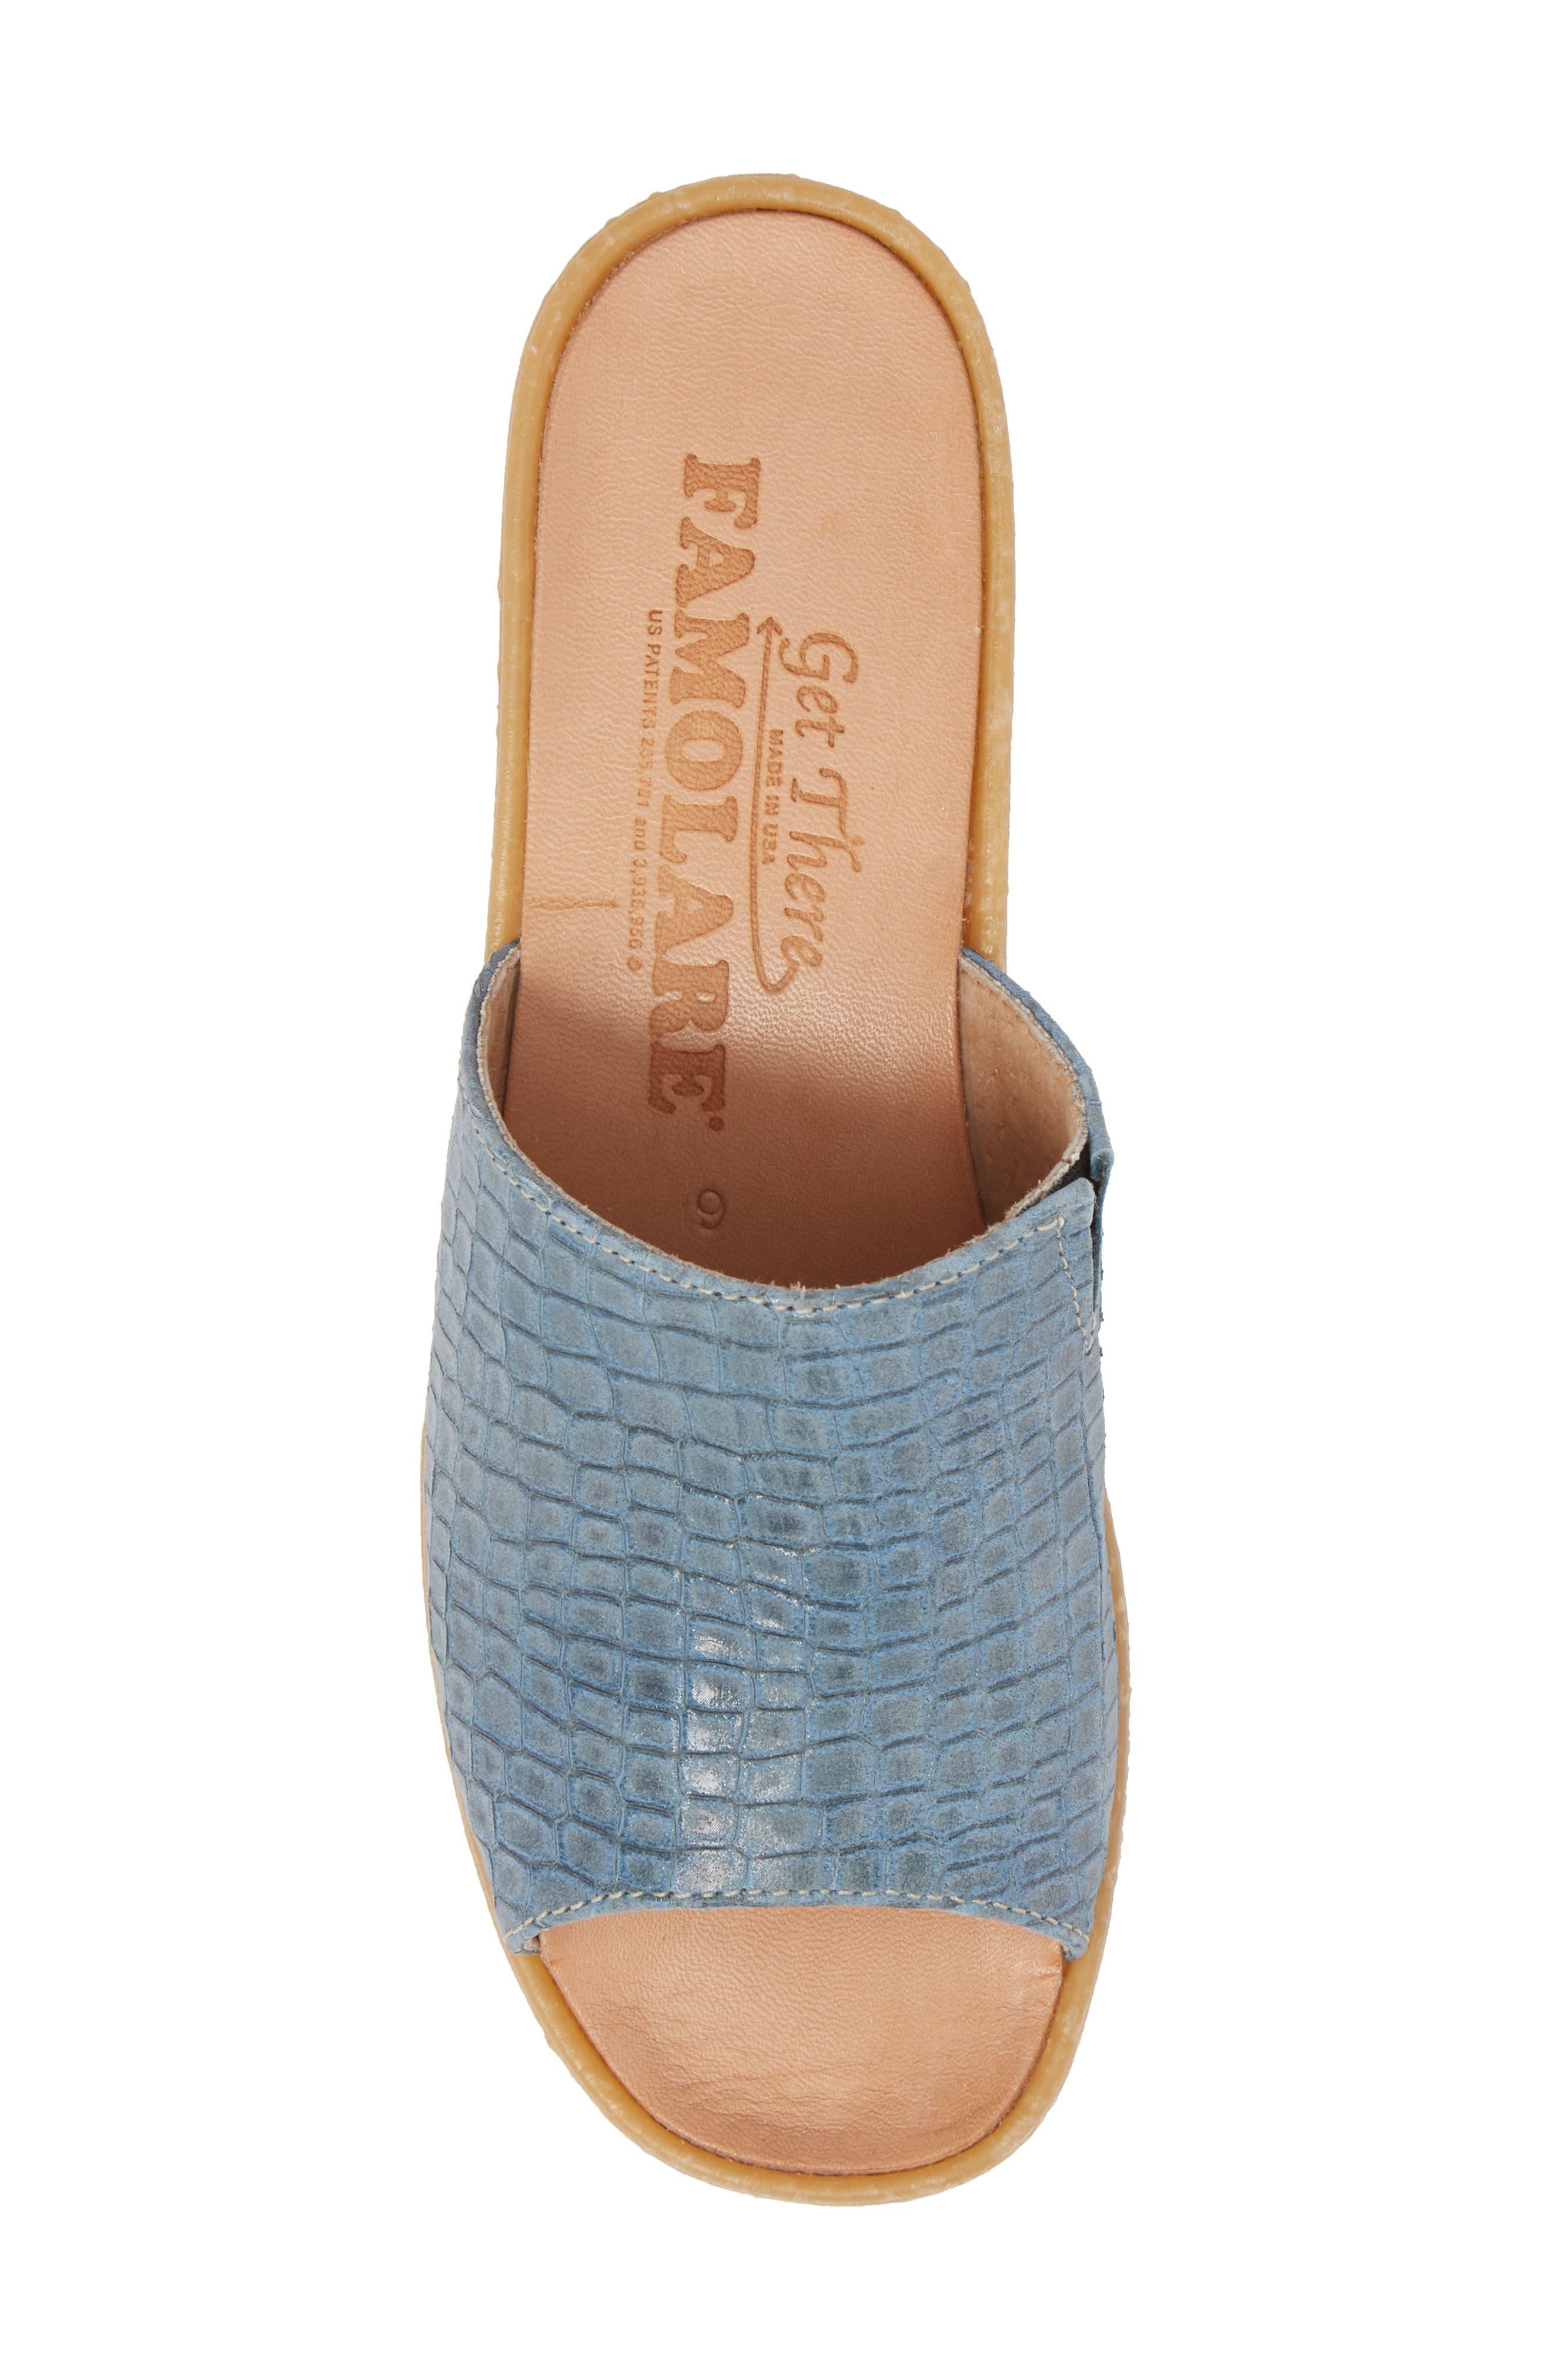 Slide N Sleek Wedge Slide Sandal,                             Alternate thumbnail 5, color,                             Aqua Croc Printed Leather